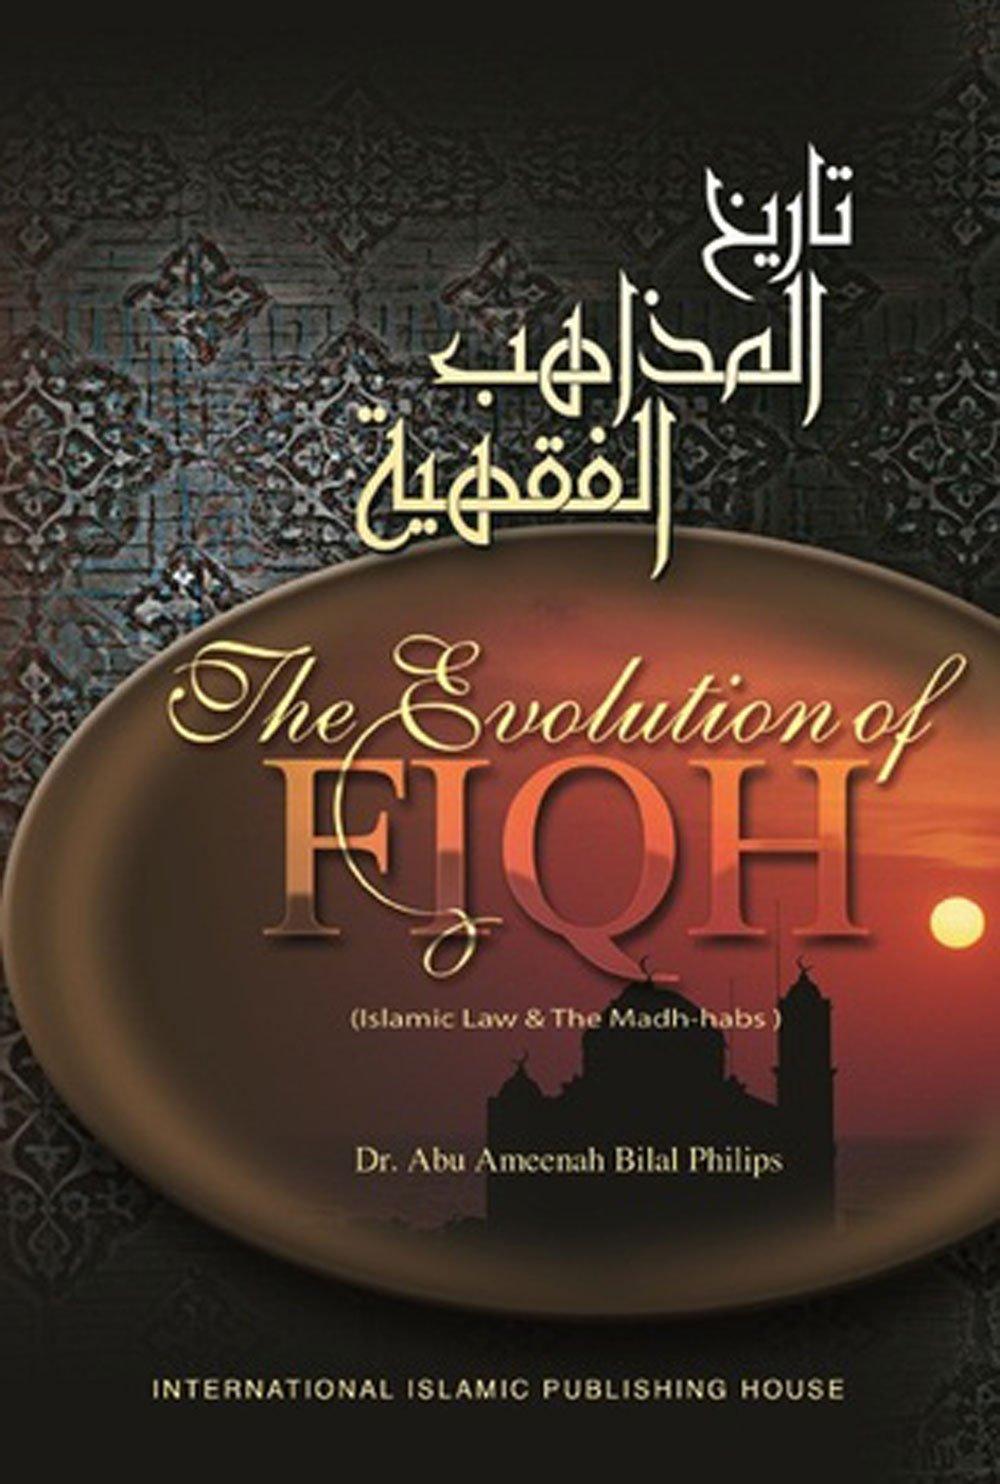 bilal ameenah philips books dr abu